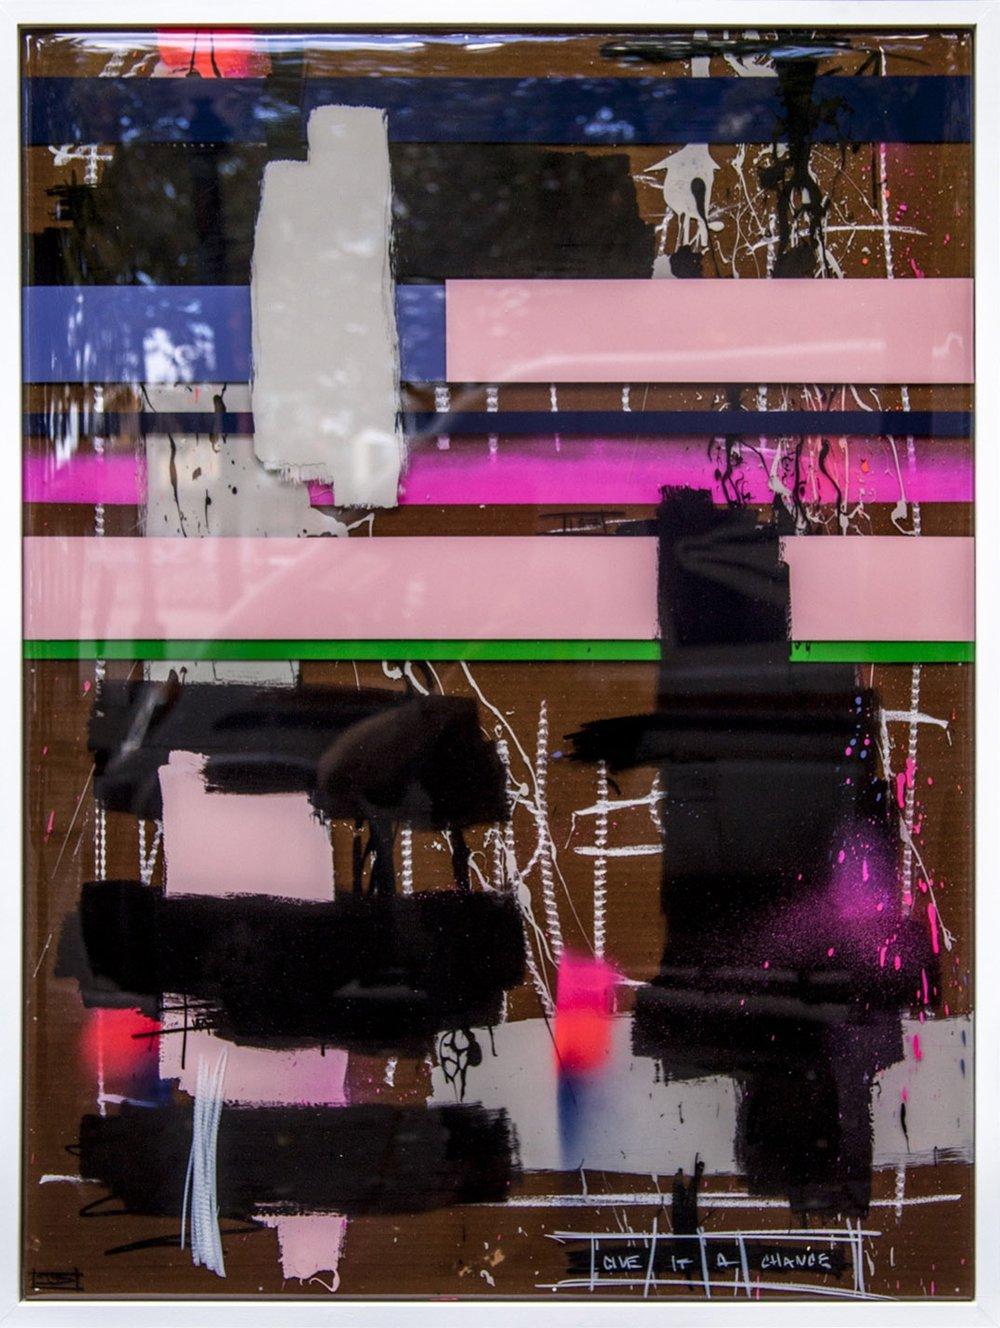 Treason Gallery_Compendium-42.jpg